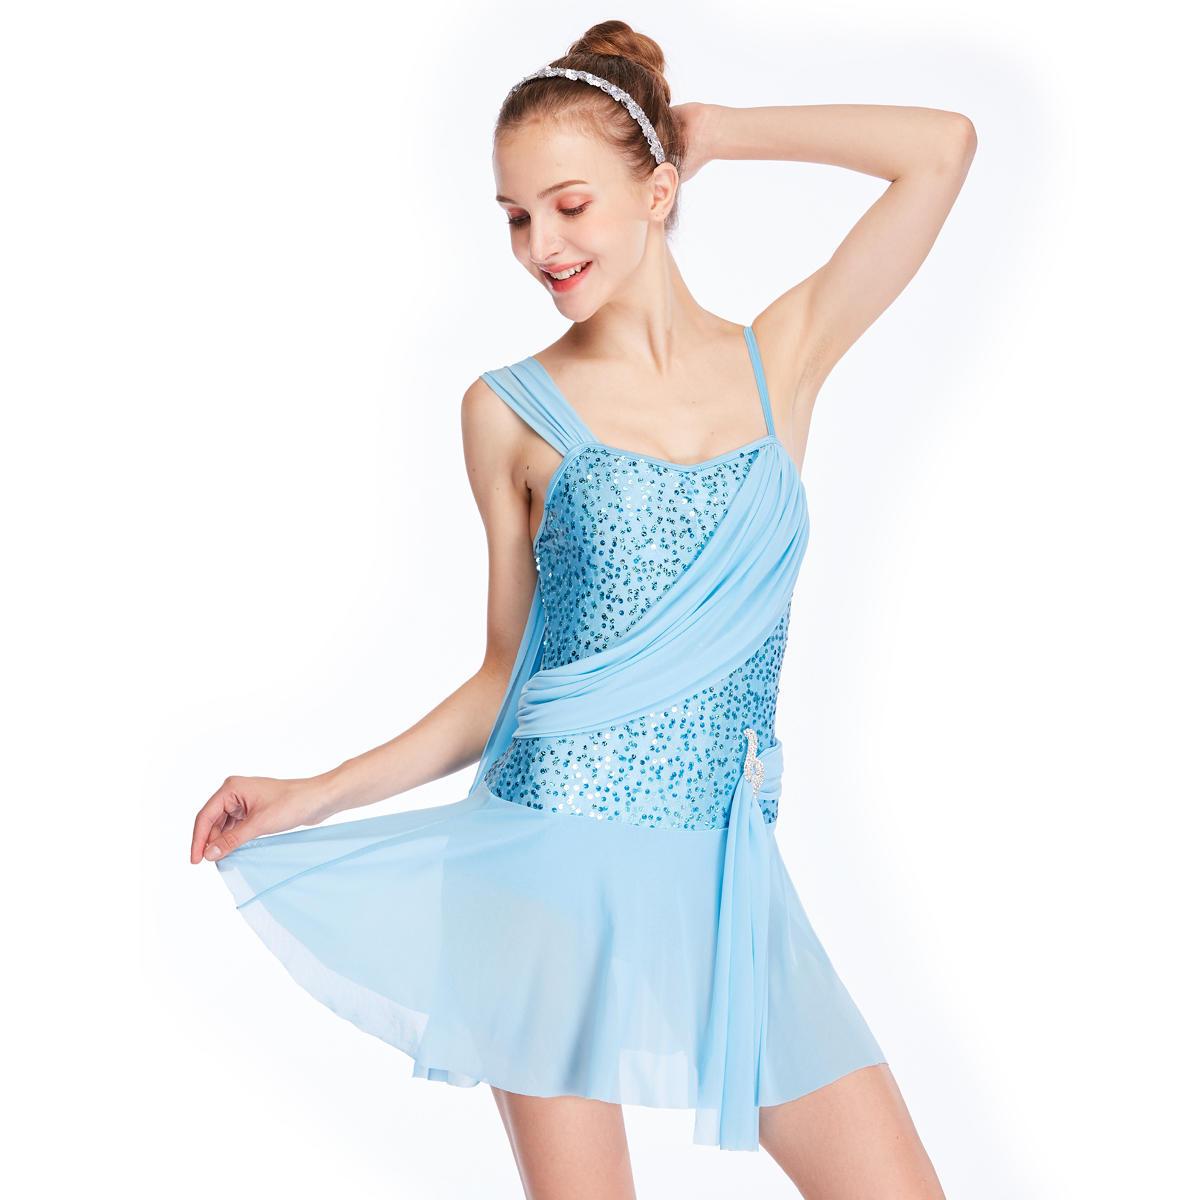 MiDee China Fashion Wholesale Stage Performance Dance Wear